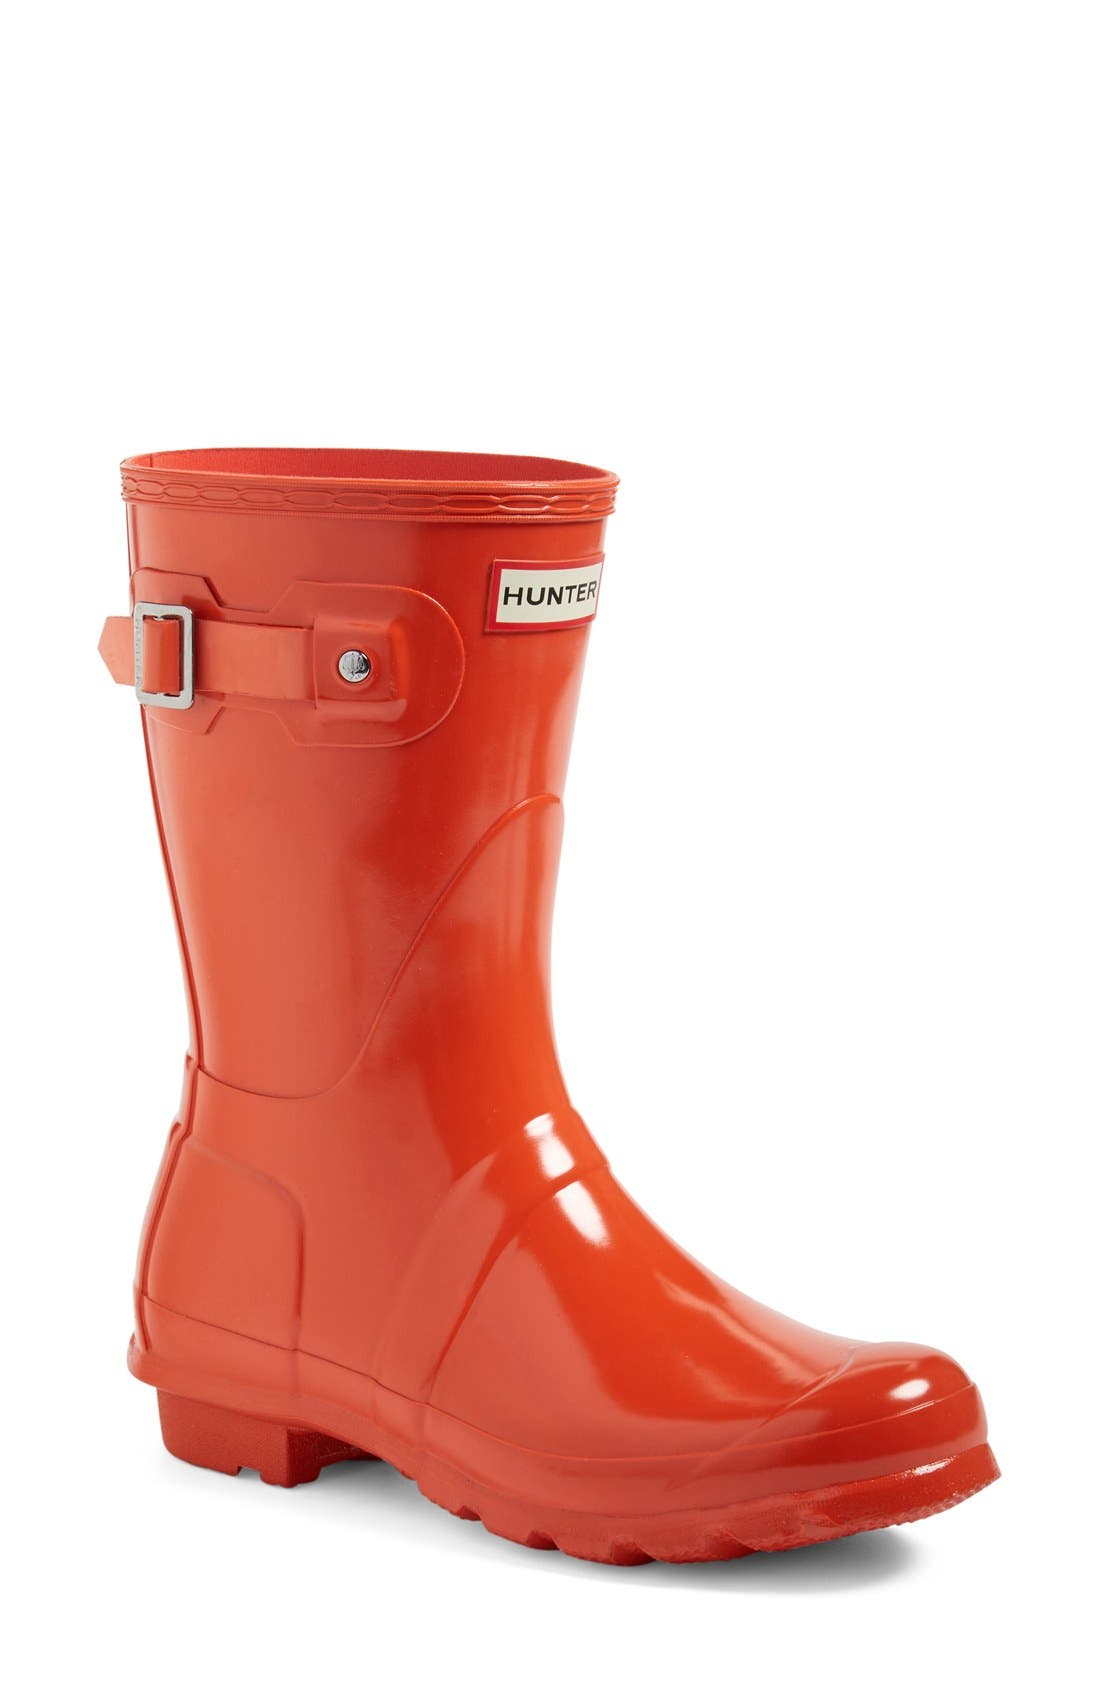 Alternate Image 1 Selected - Hunter 'Original Short' Gloss Rain Boot (Women)